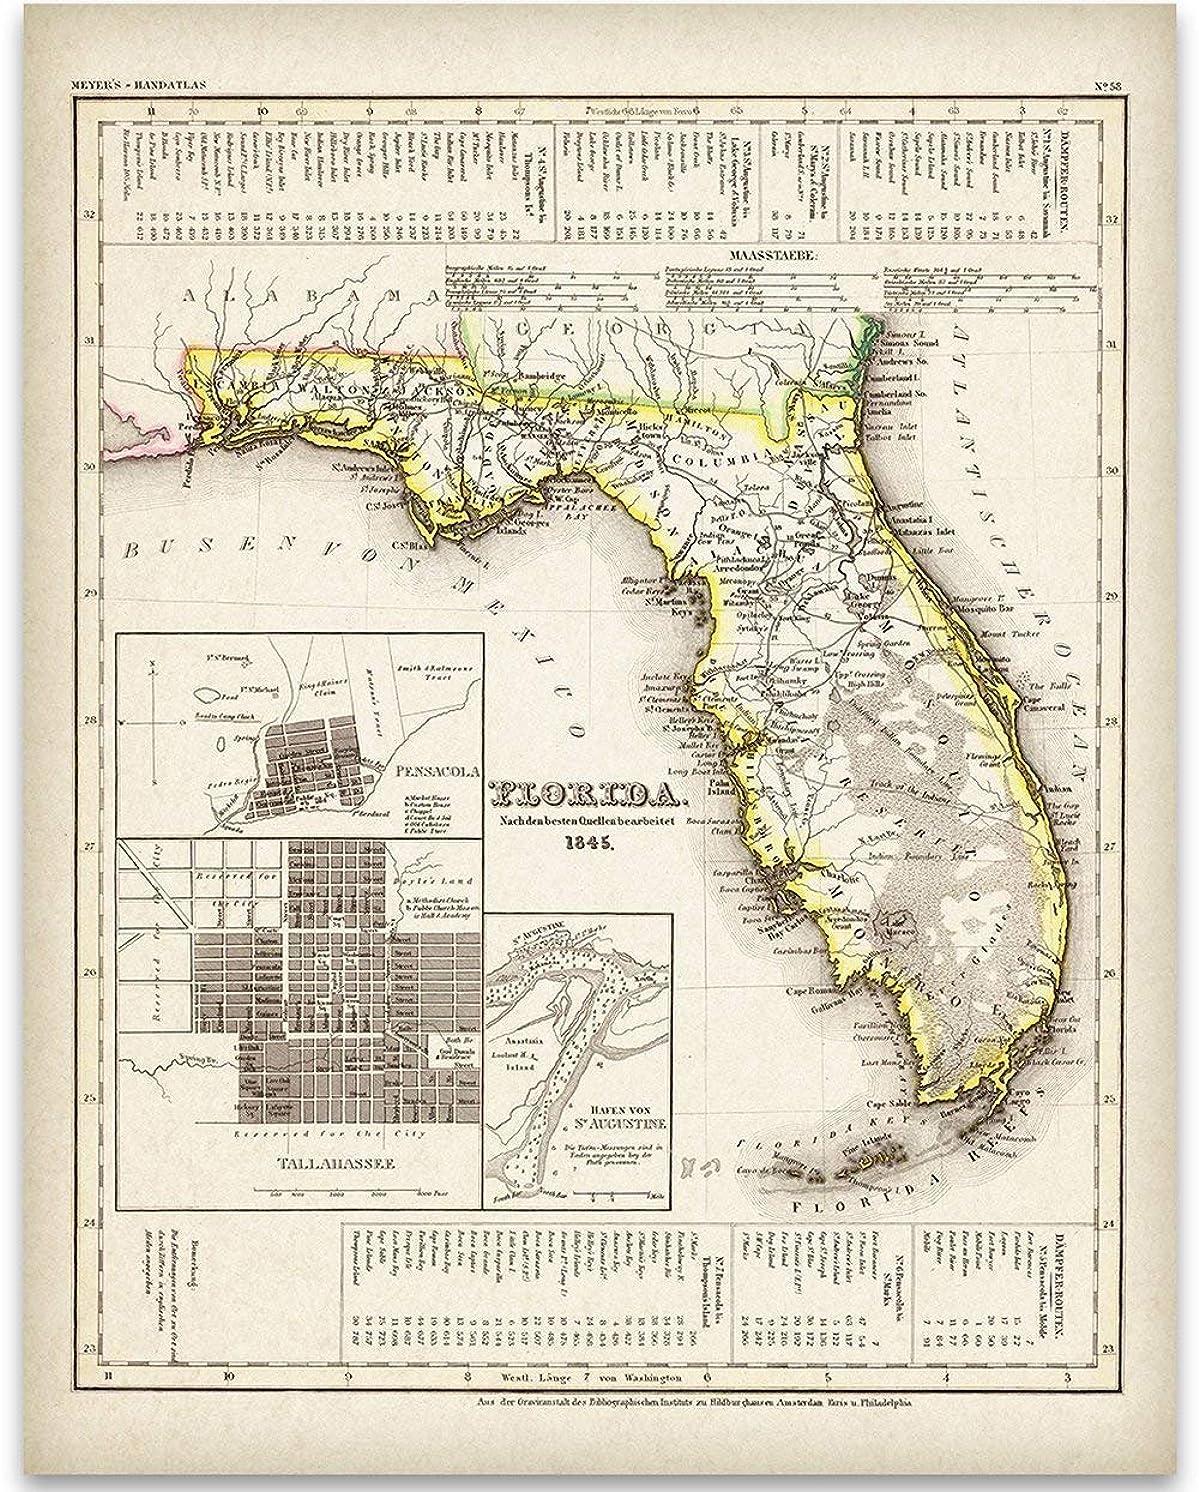 1845 Map of Florida Art Print - 11x14 Unframed Art Print - Great Vintage Home Decor Under $15